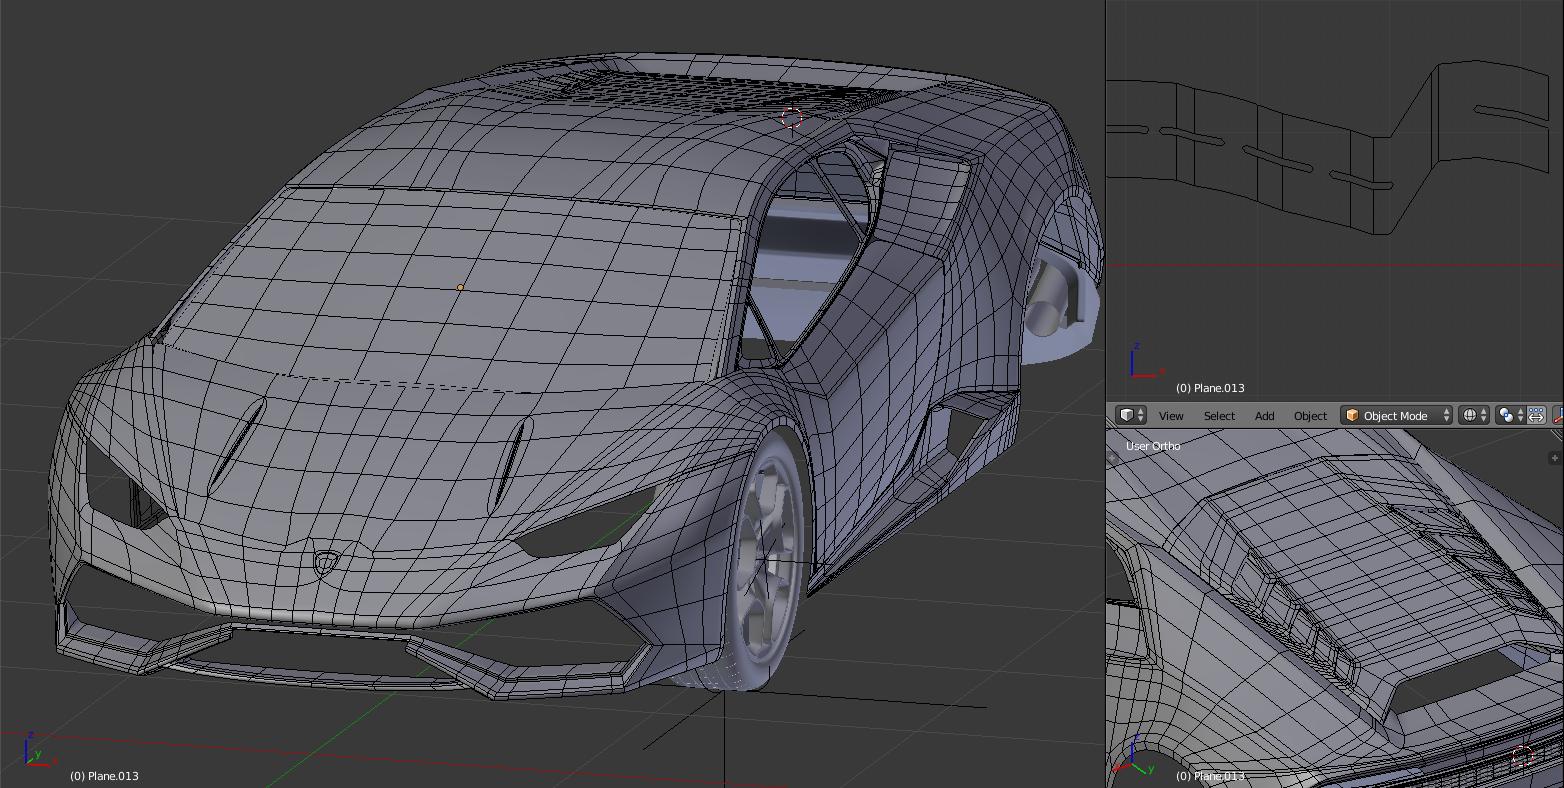 Lamborghini Huracan Finished Works In Progress Blender Artists Community